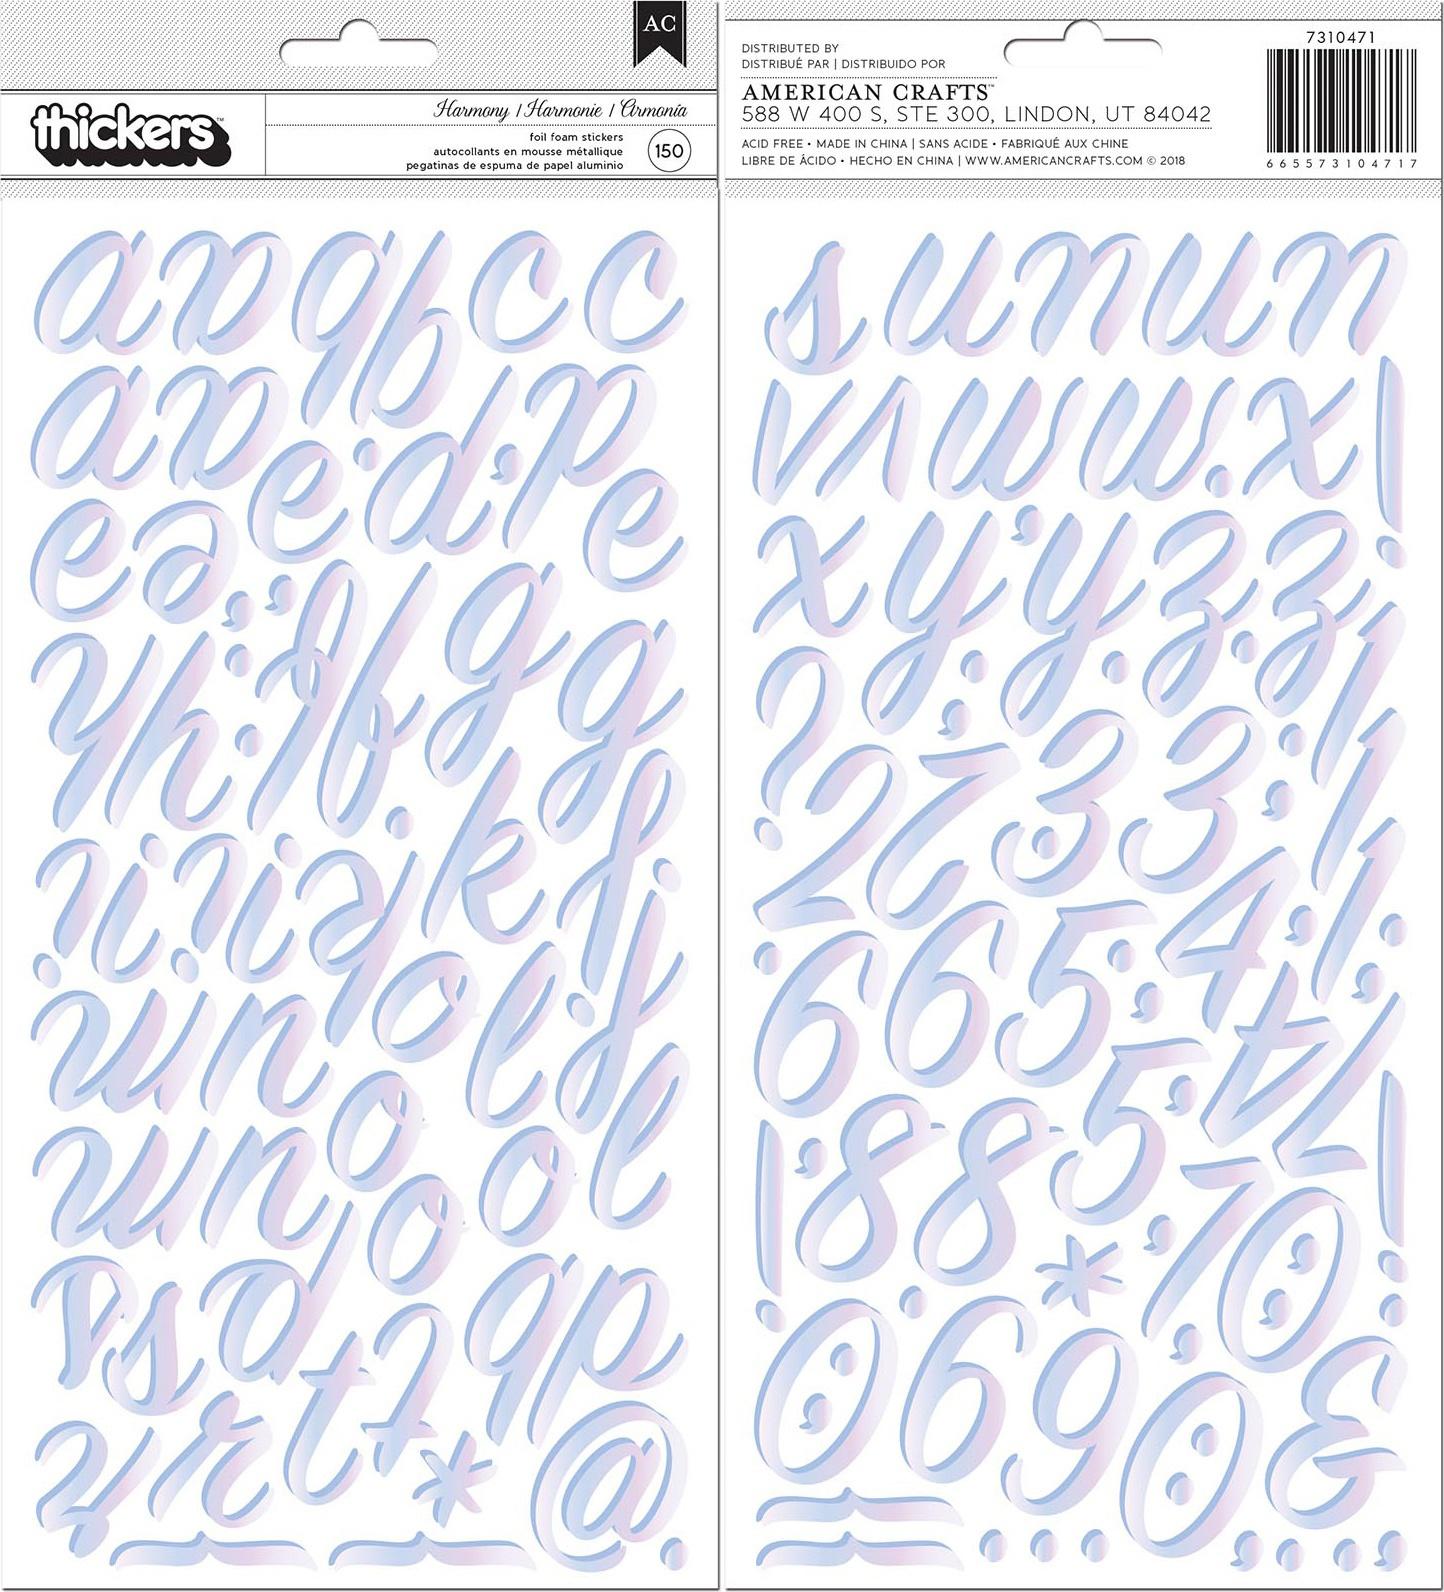 American Crafts Thickers Stickers 5.5X11 150/Pkg-Harmony, Alphabet W/Iridescen...